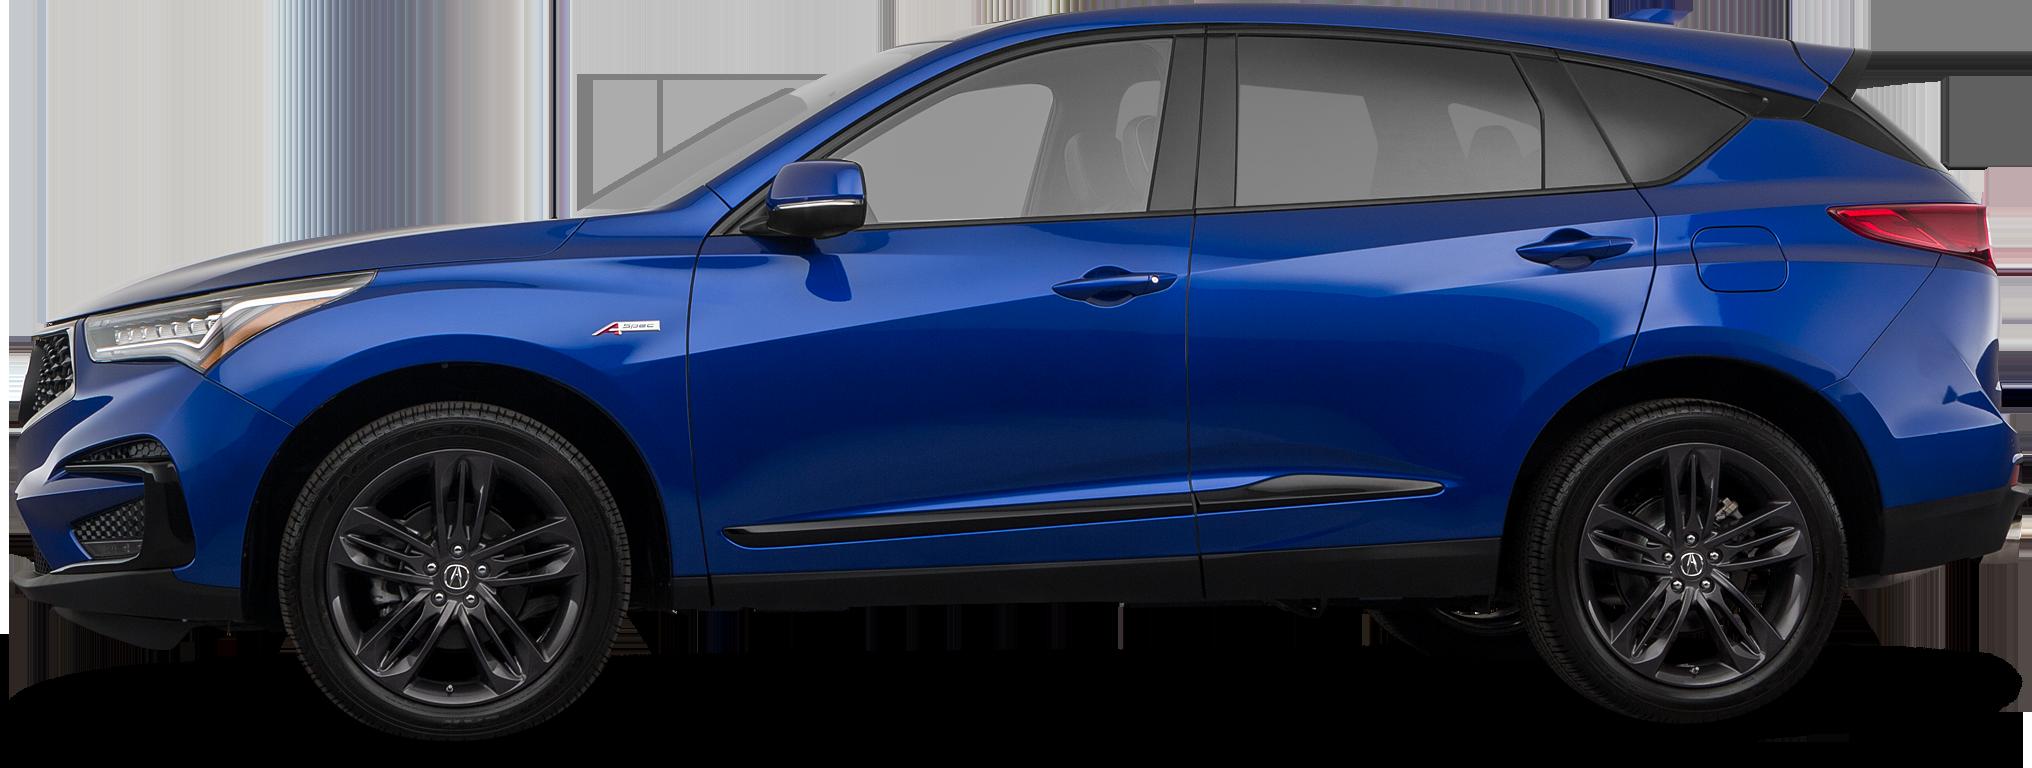 2021 Acura RDX SUV A-Spec